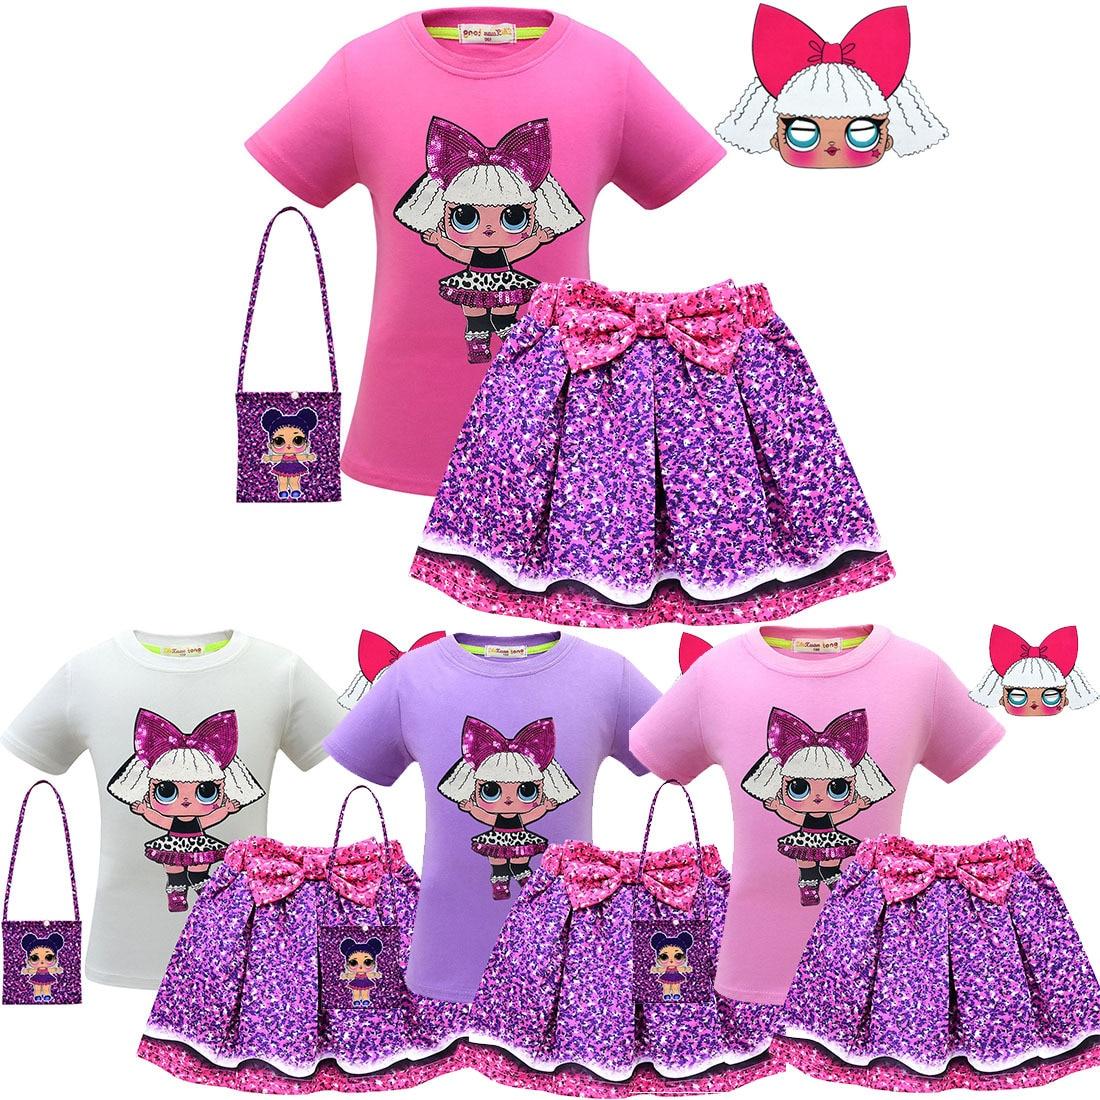 2019 New Surprise Children LOl Suit Skirt Cartoon Girls Short-sleeved Pleated Skirt Bow Mask 4 Sets